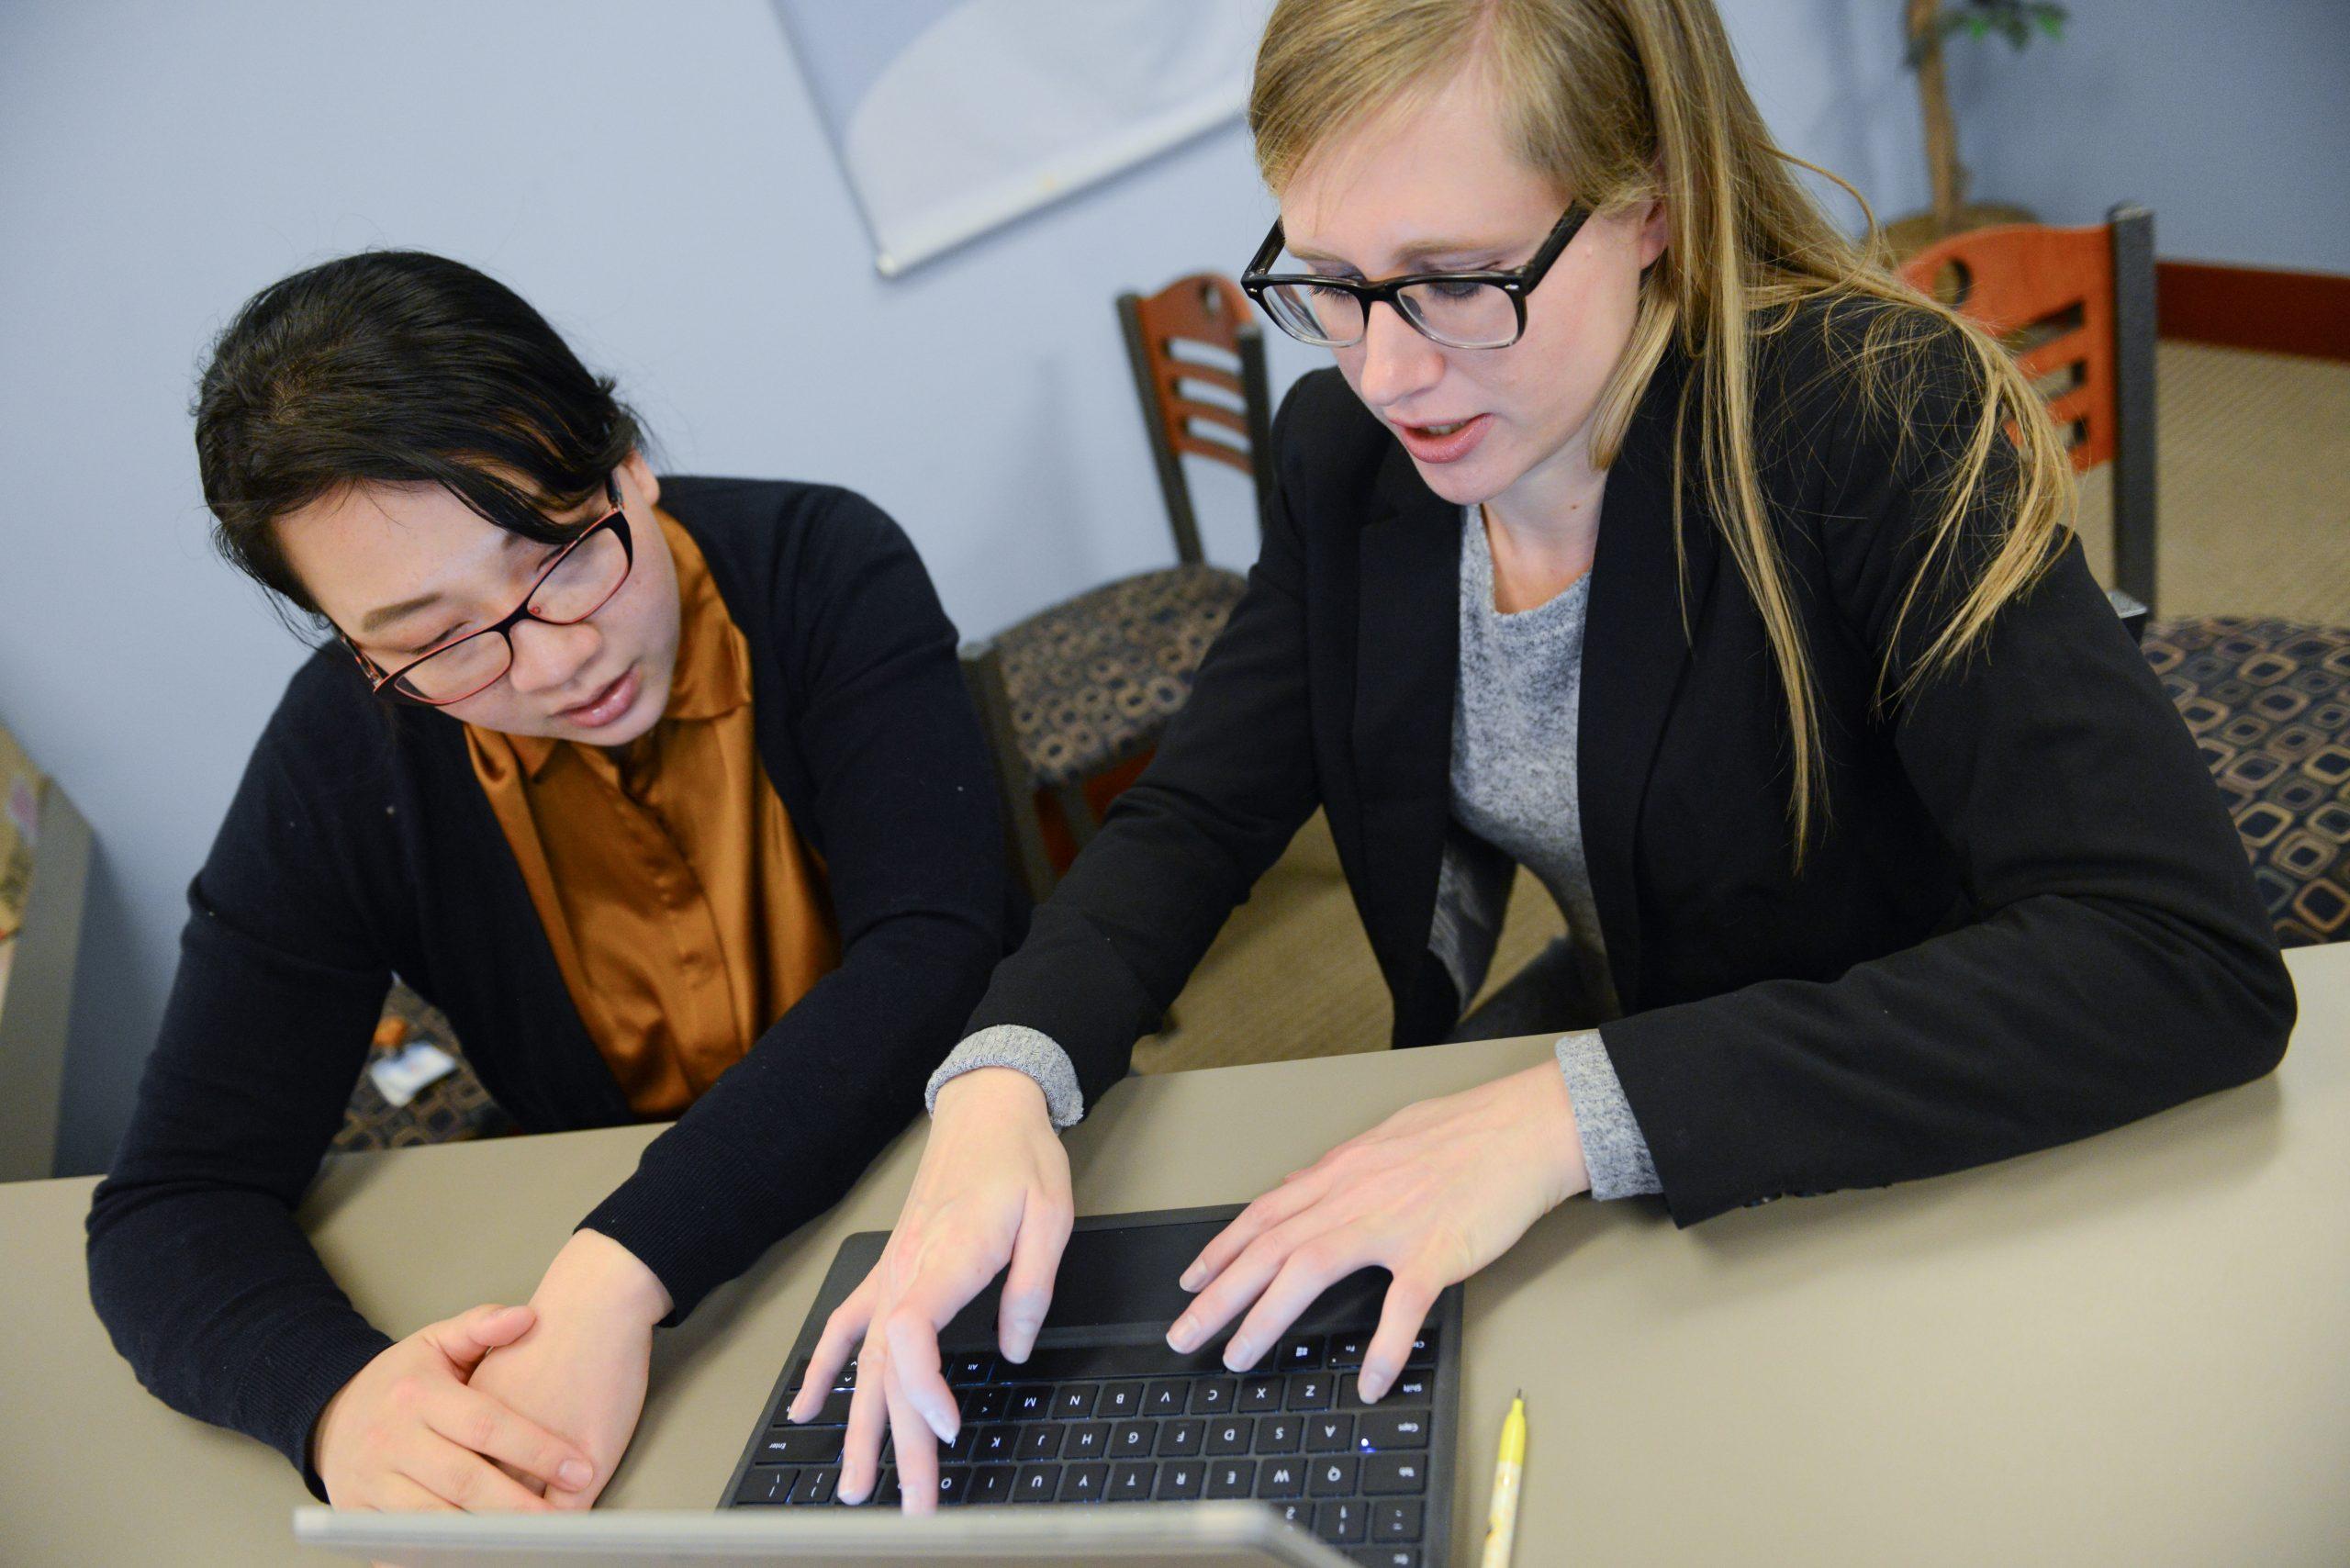 rebecca carlson types on laptop